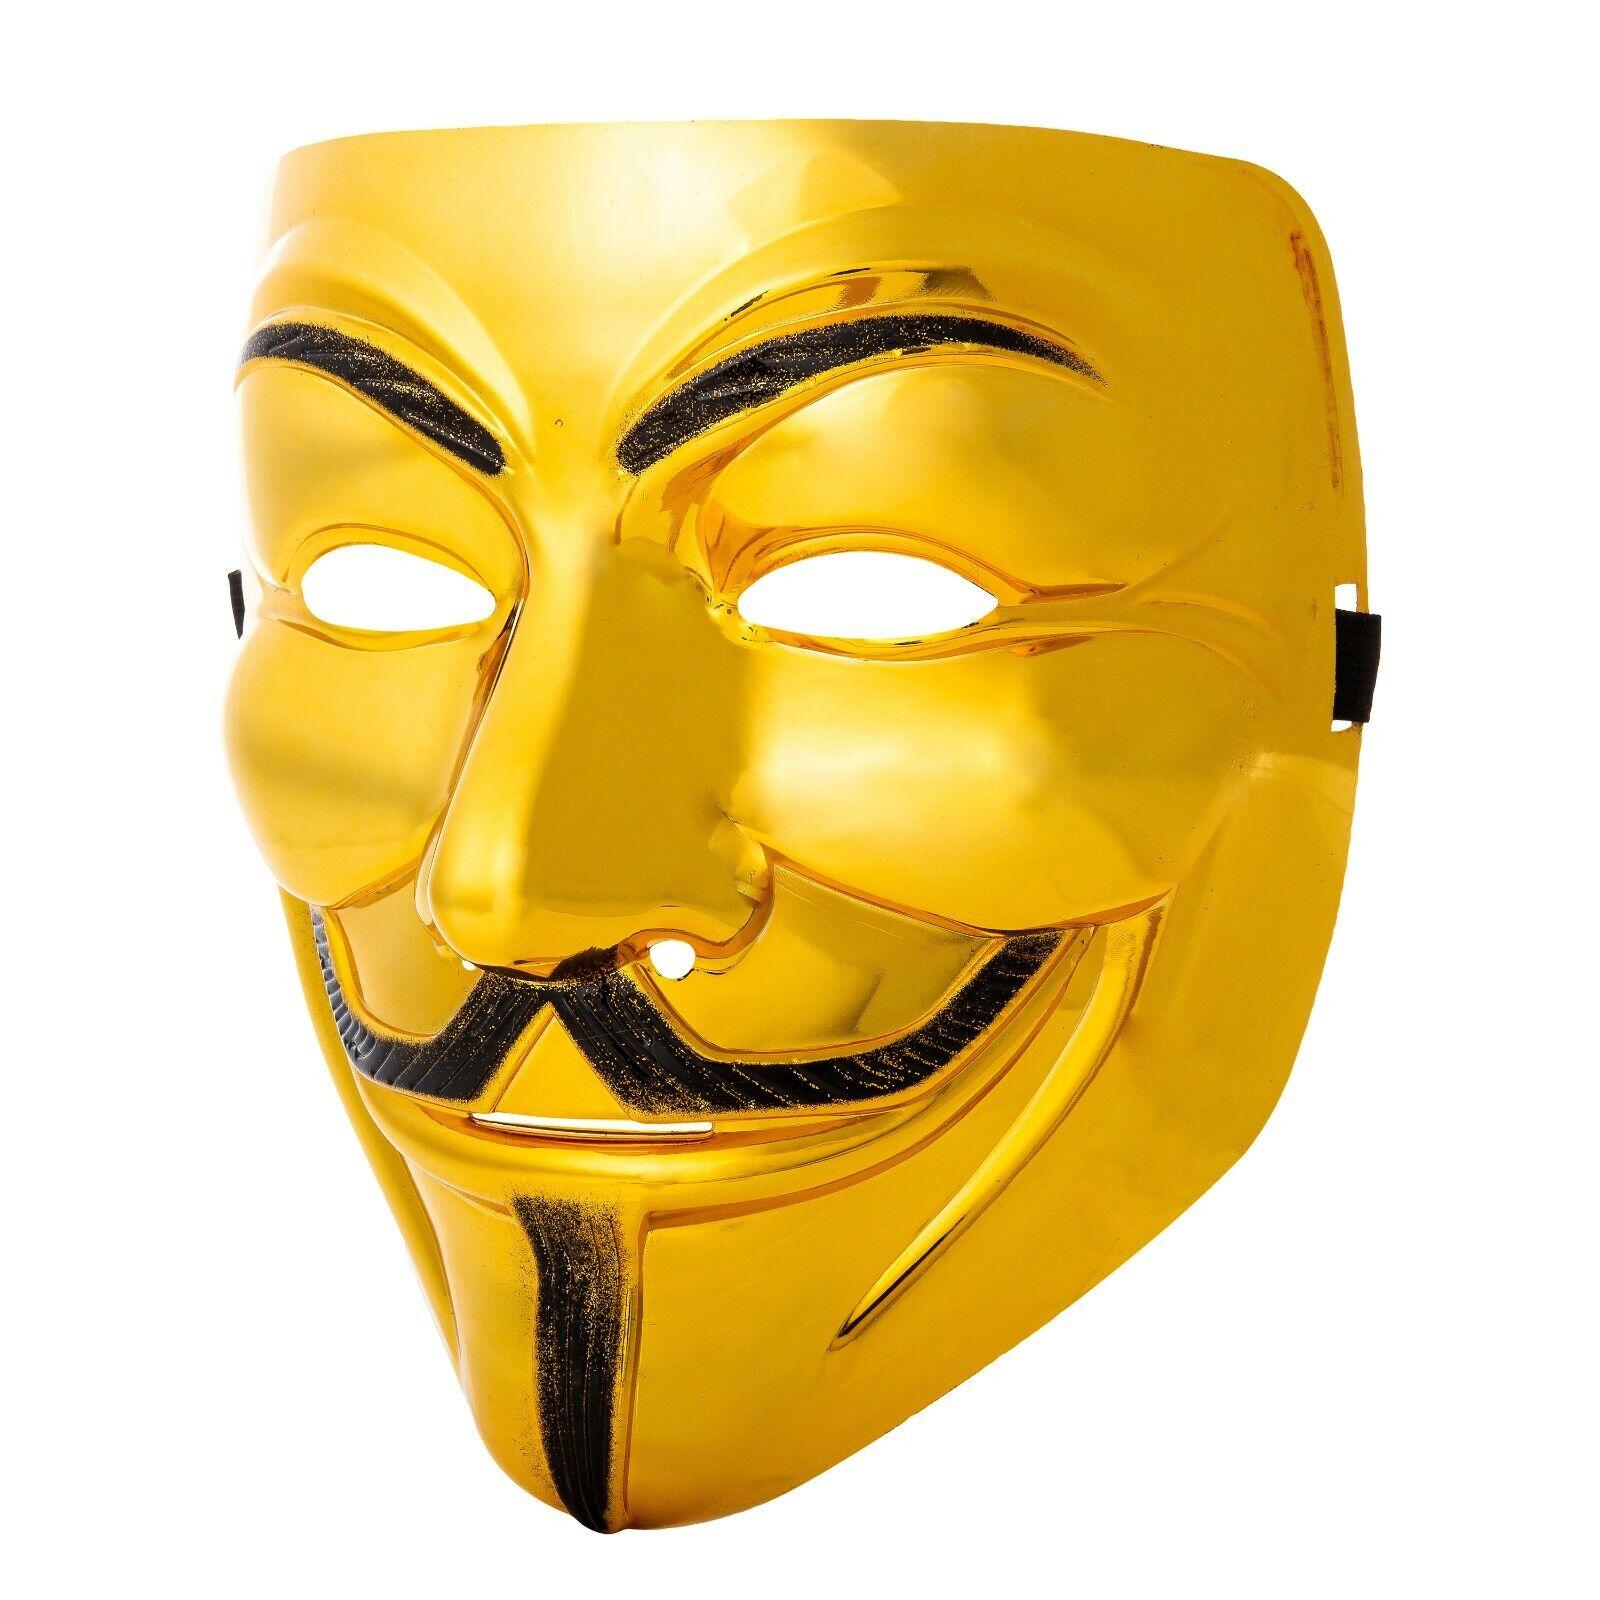 MASCHERA Per Gli Occhi Occhiali Stile tutti i tipi di Masquerade Party Fancy Dress ADULT